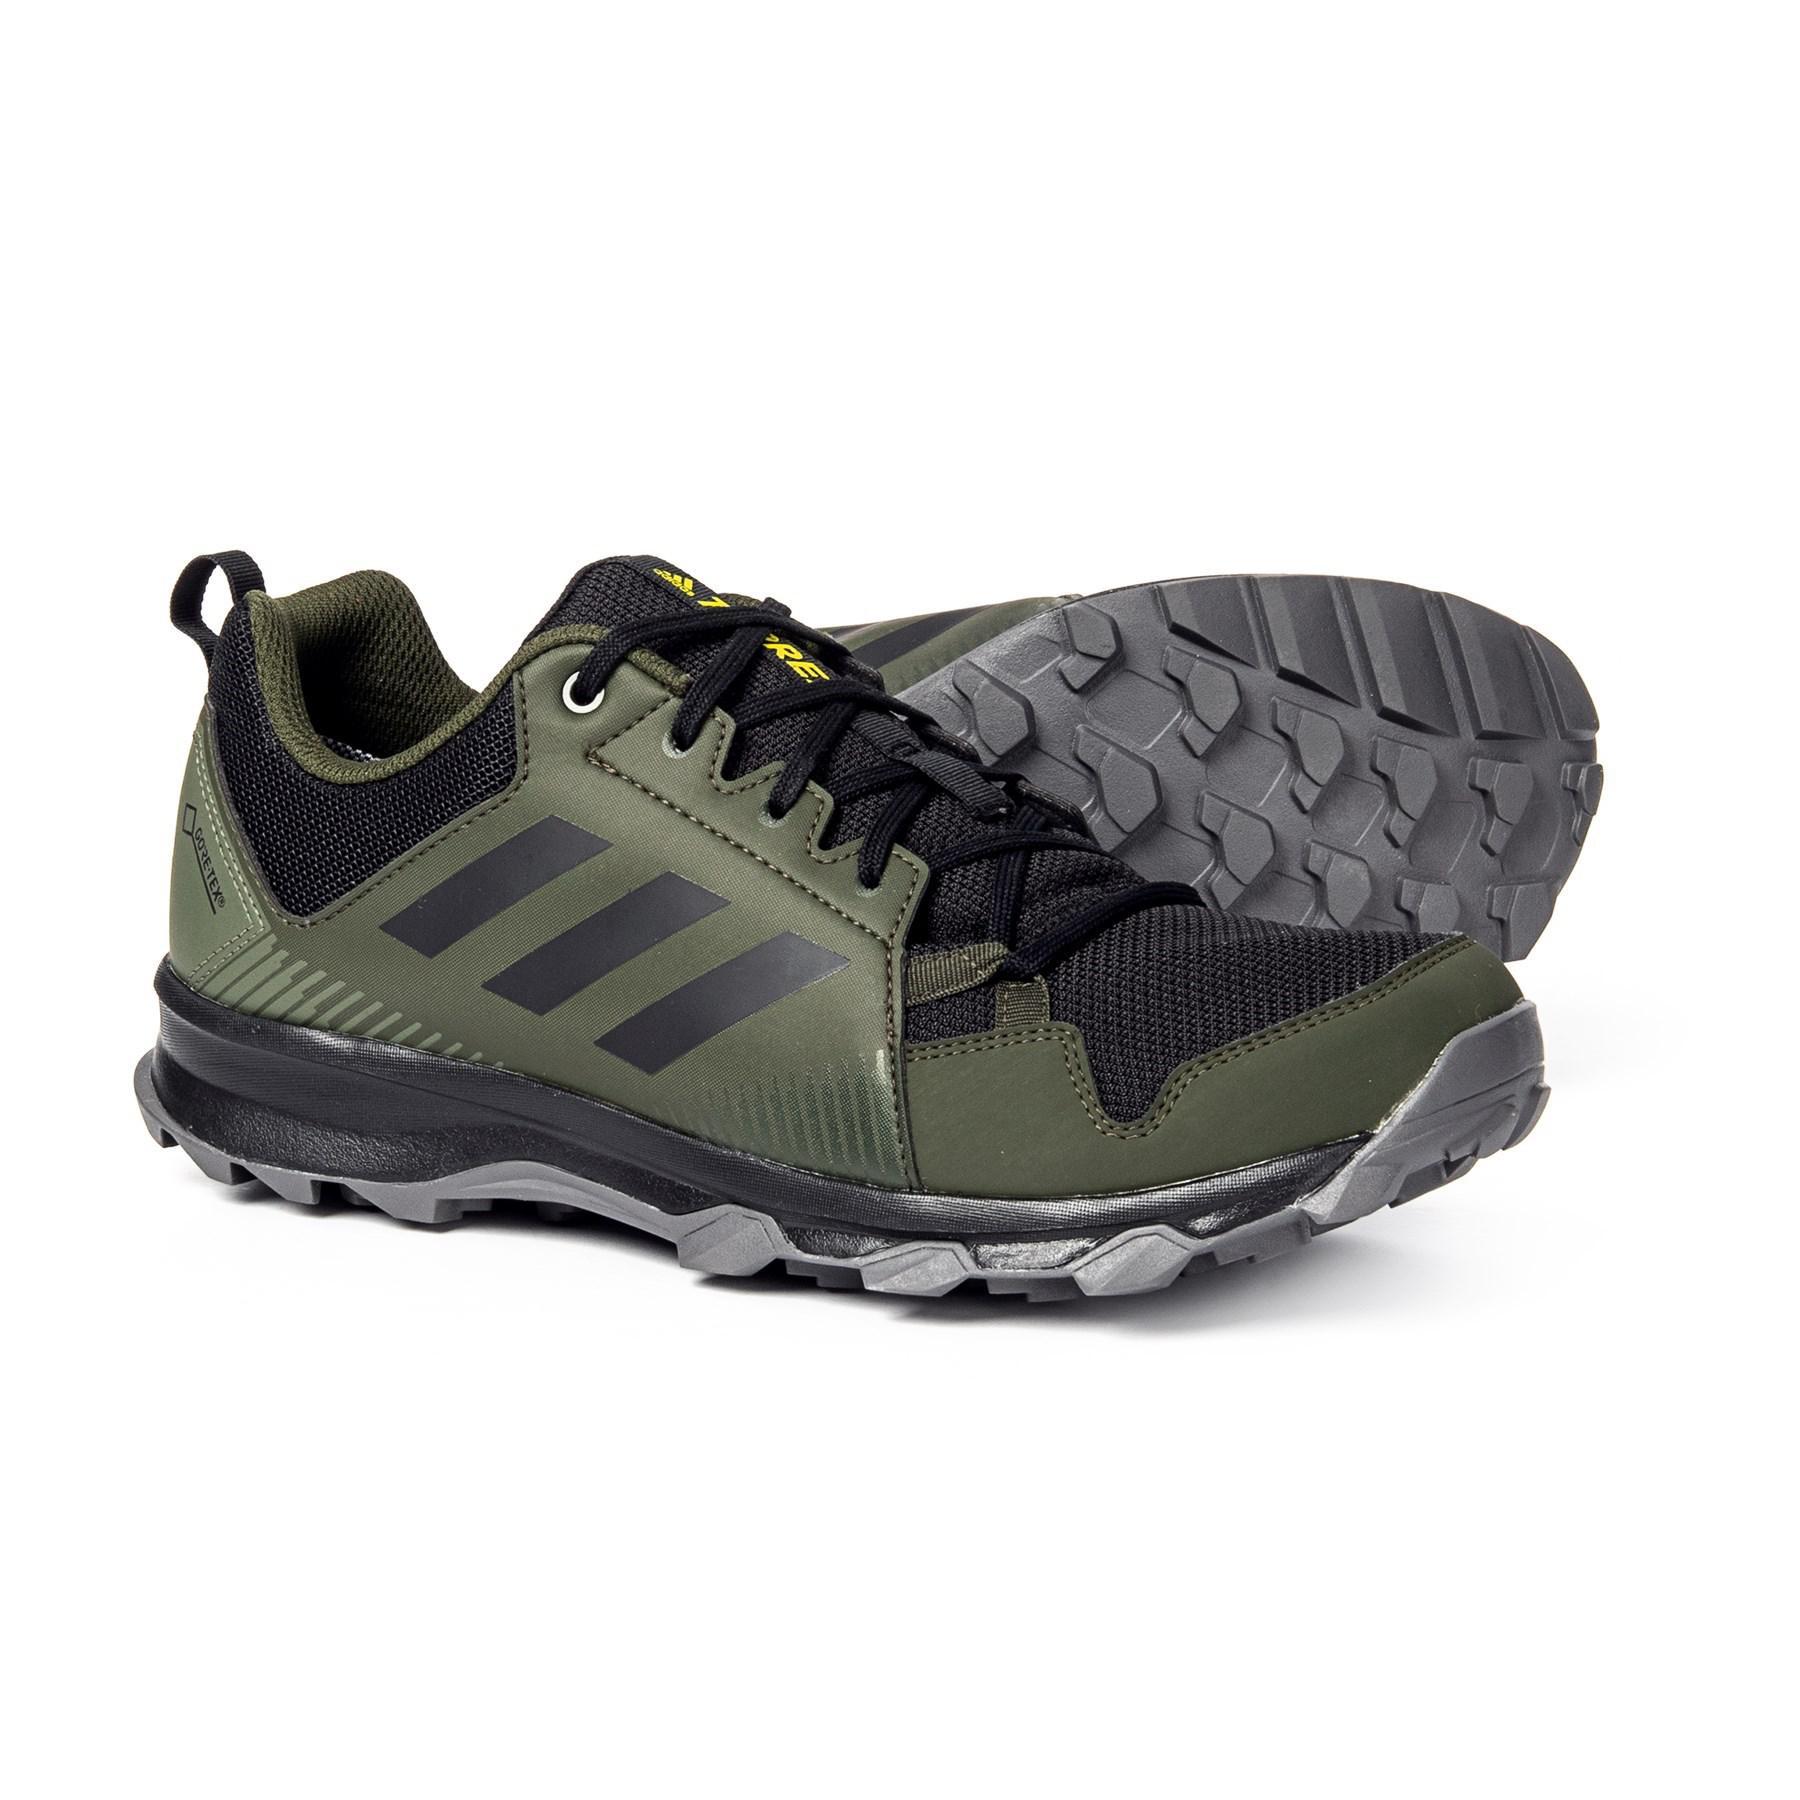 cff554db4b5f Lyst - adidas Terrex Tracerocker Gore-tex® Trail Running Shoes in ...